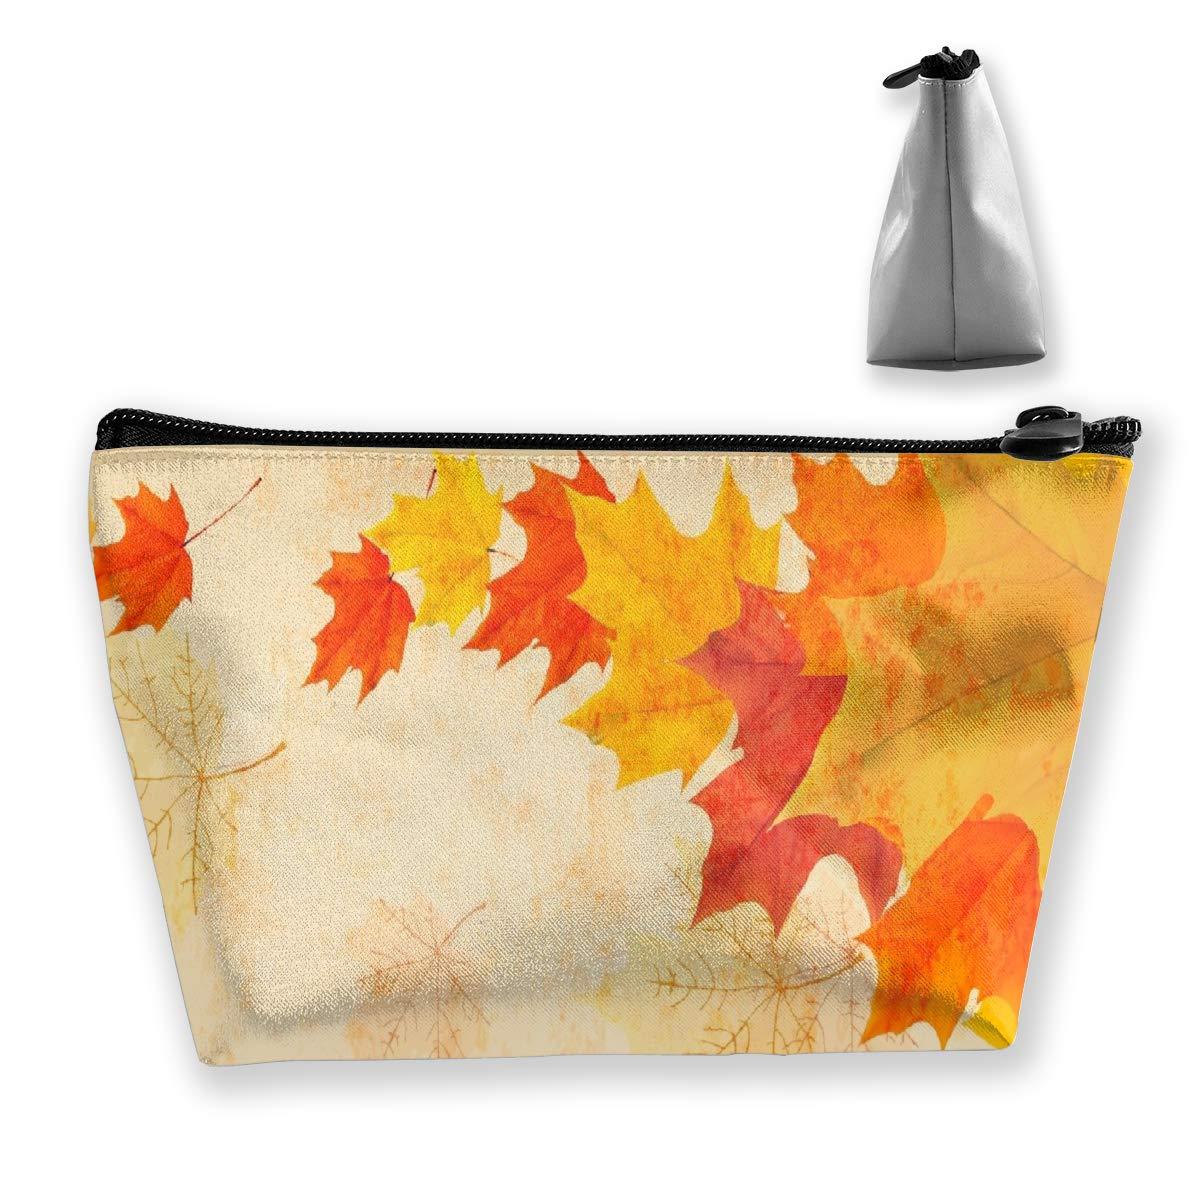 Trapezoid Toiletry Pouch Portable Travel Bag Maple Leaves Pen Organizer